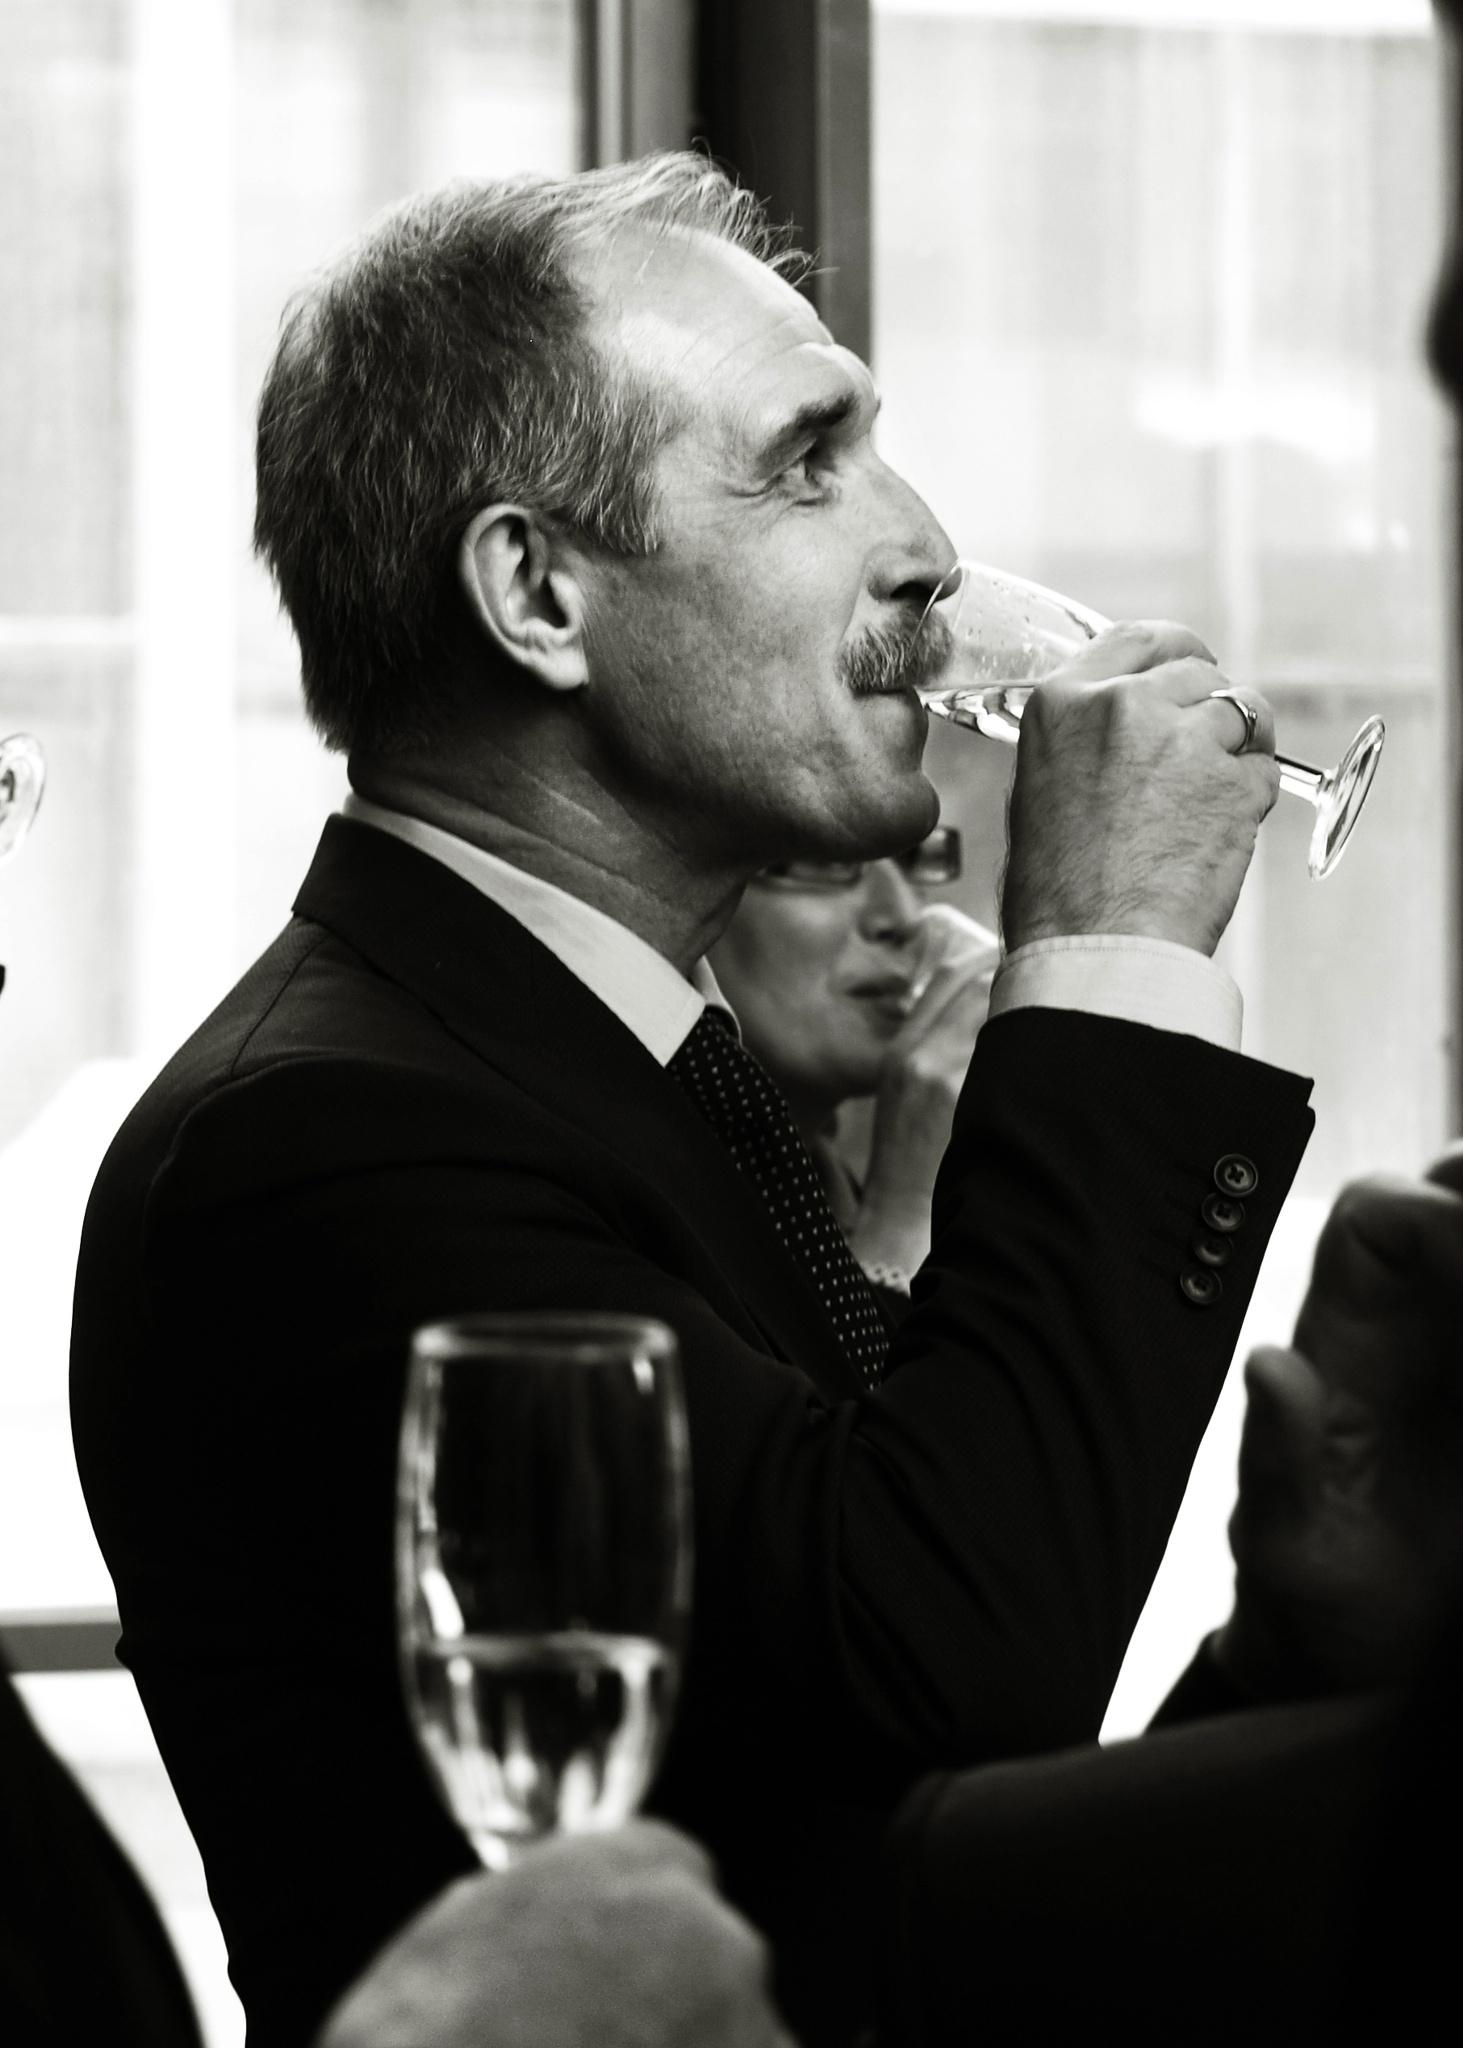 A toast to prosperity by Сергей Юрьев